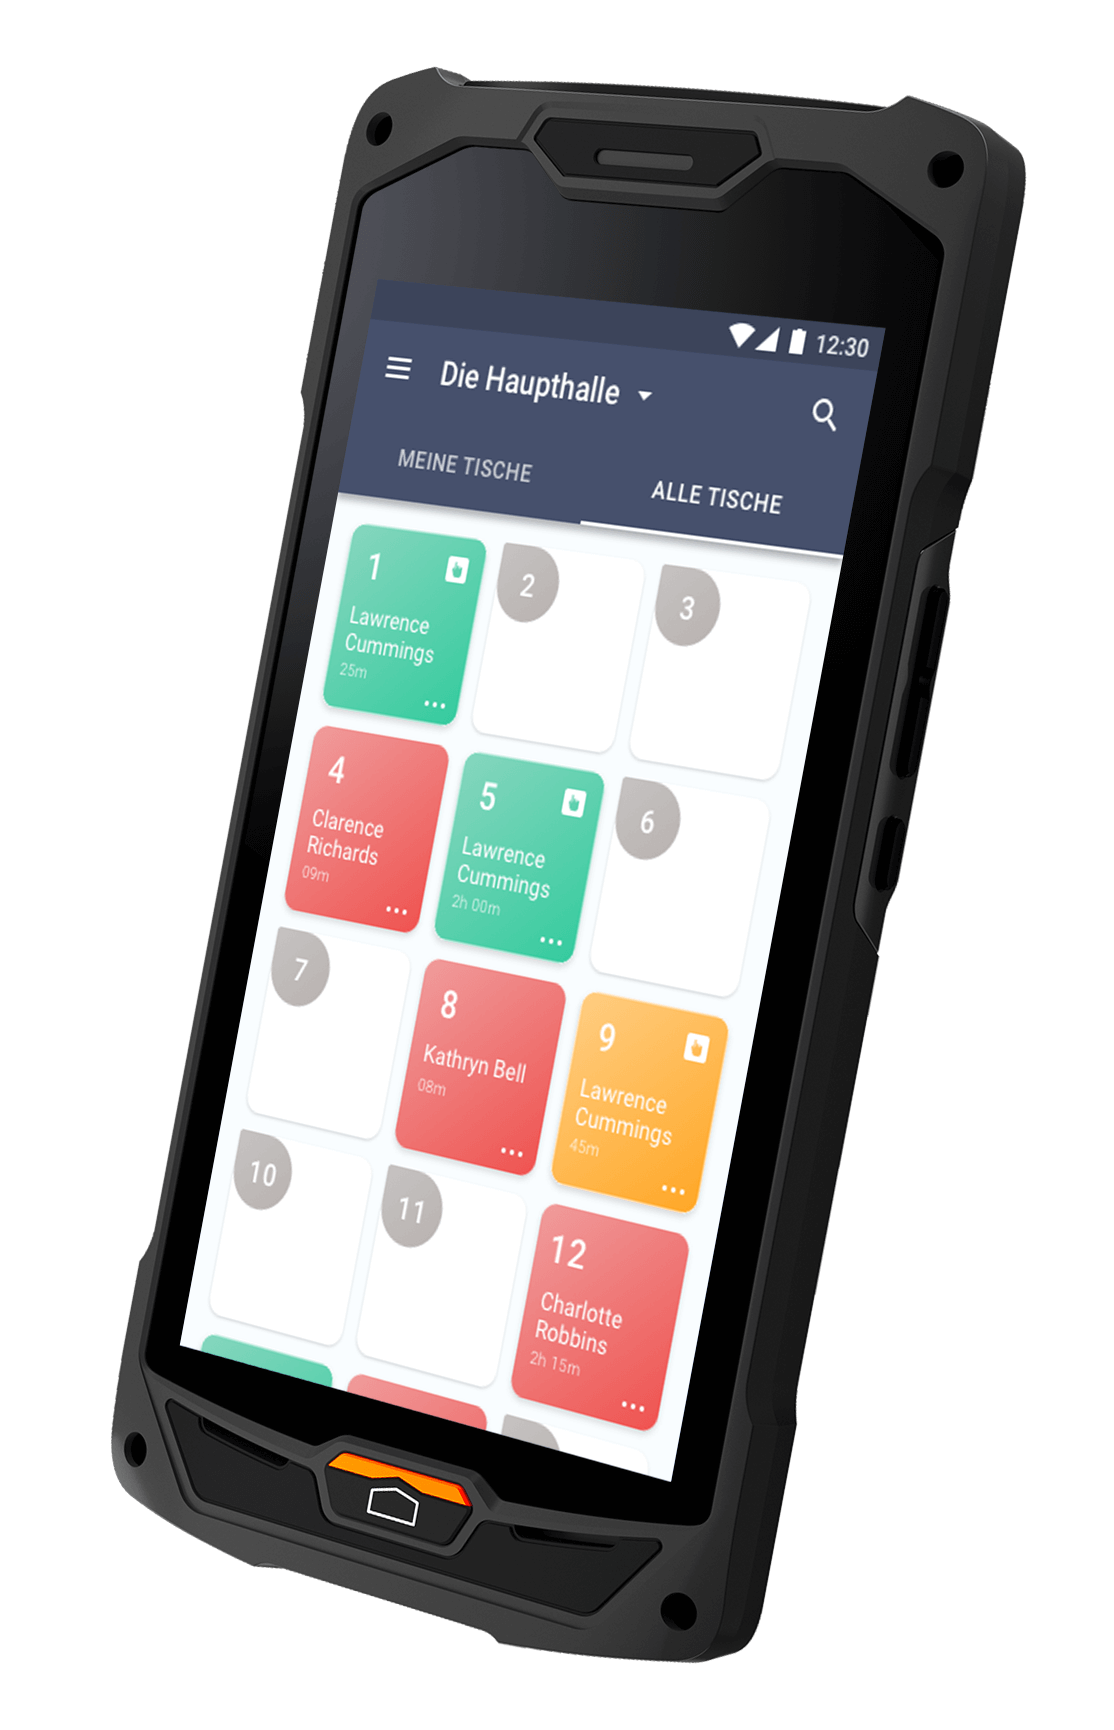 Bäckerei CashAssist mobile Waiter App